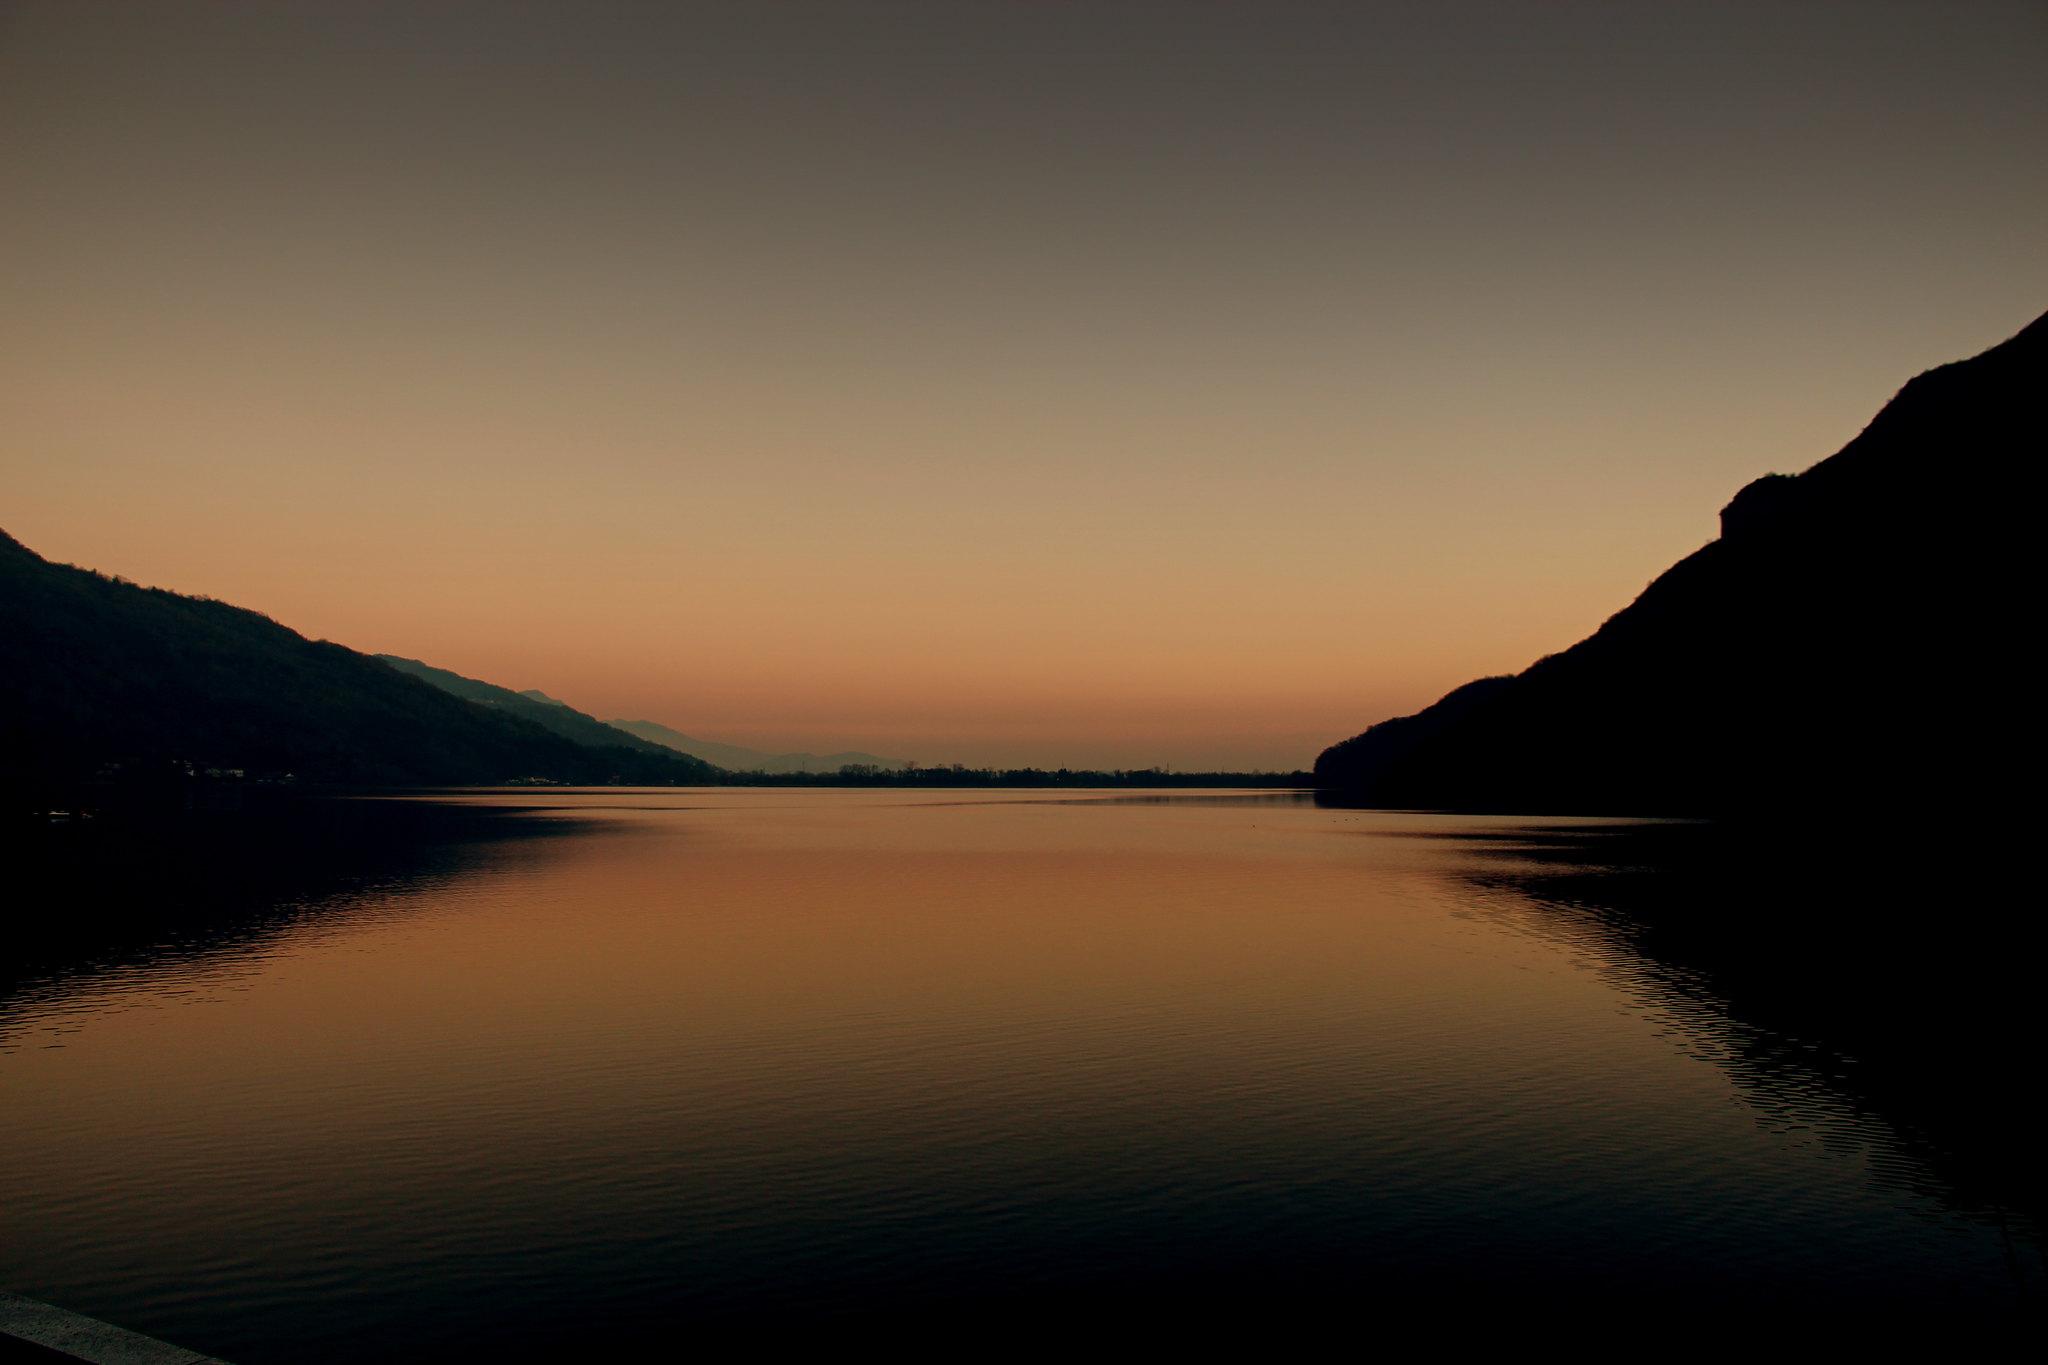 lago di mergozzo origine